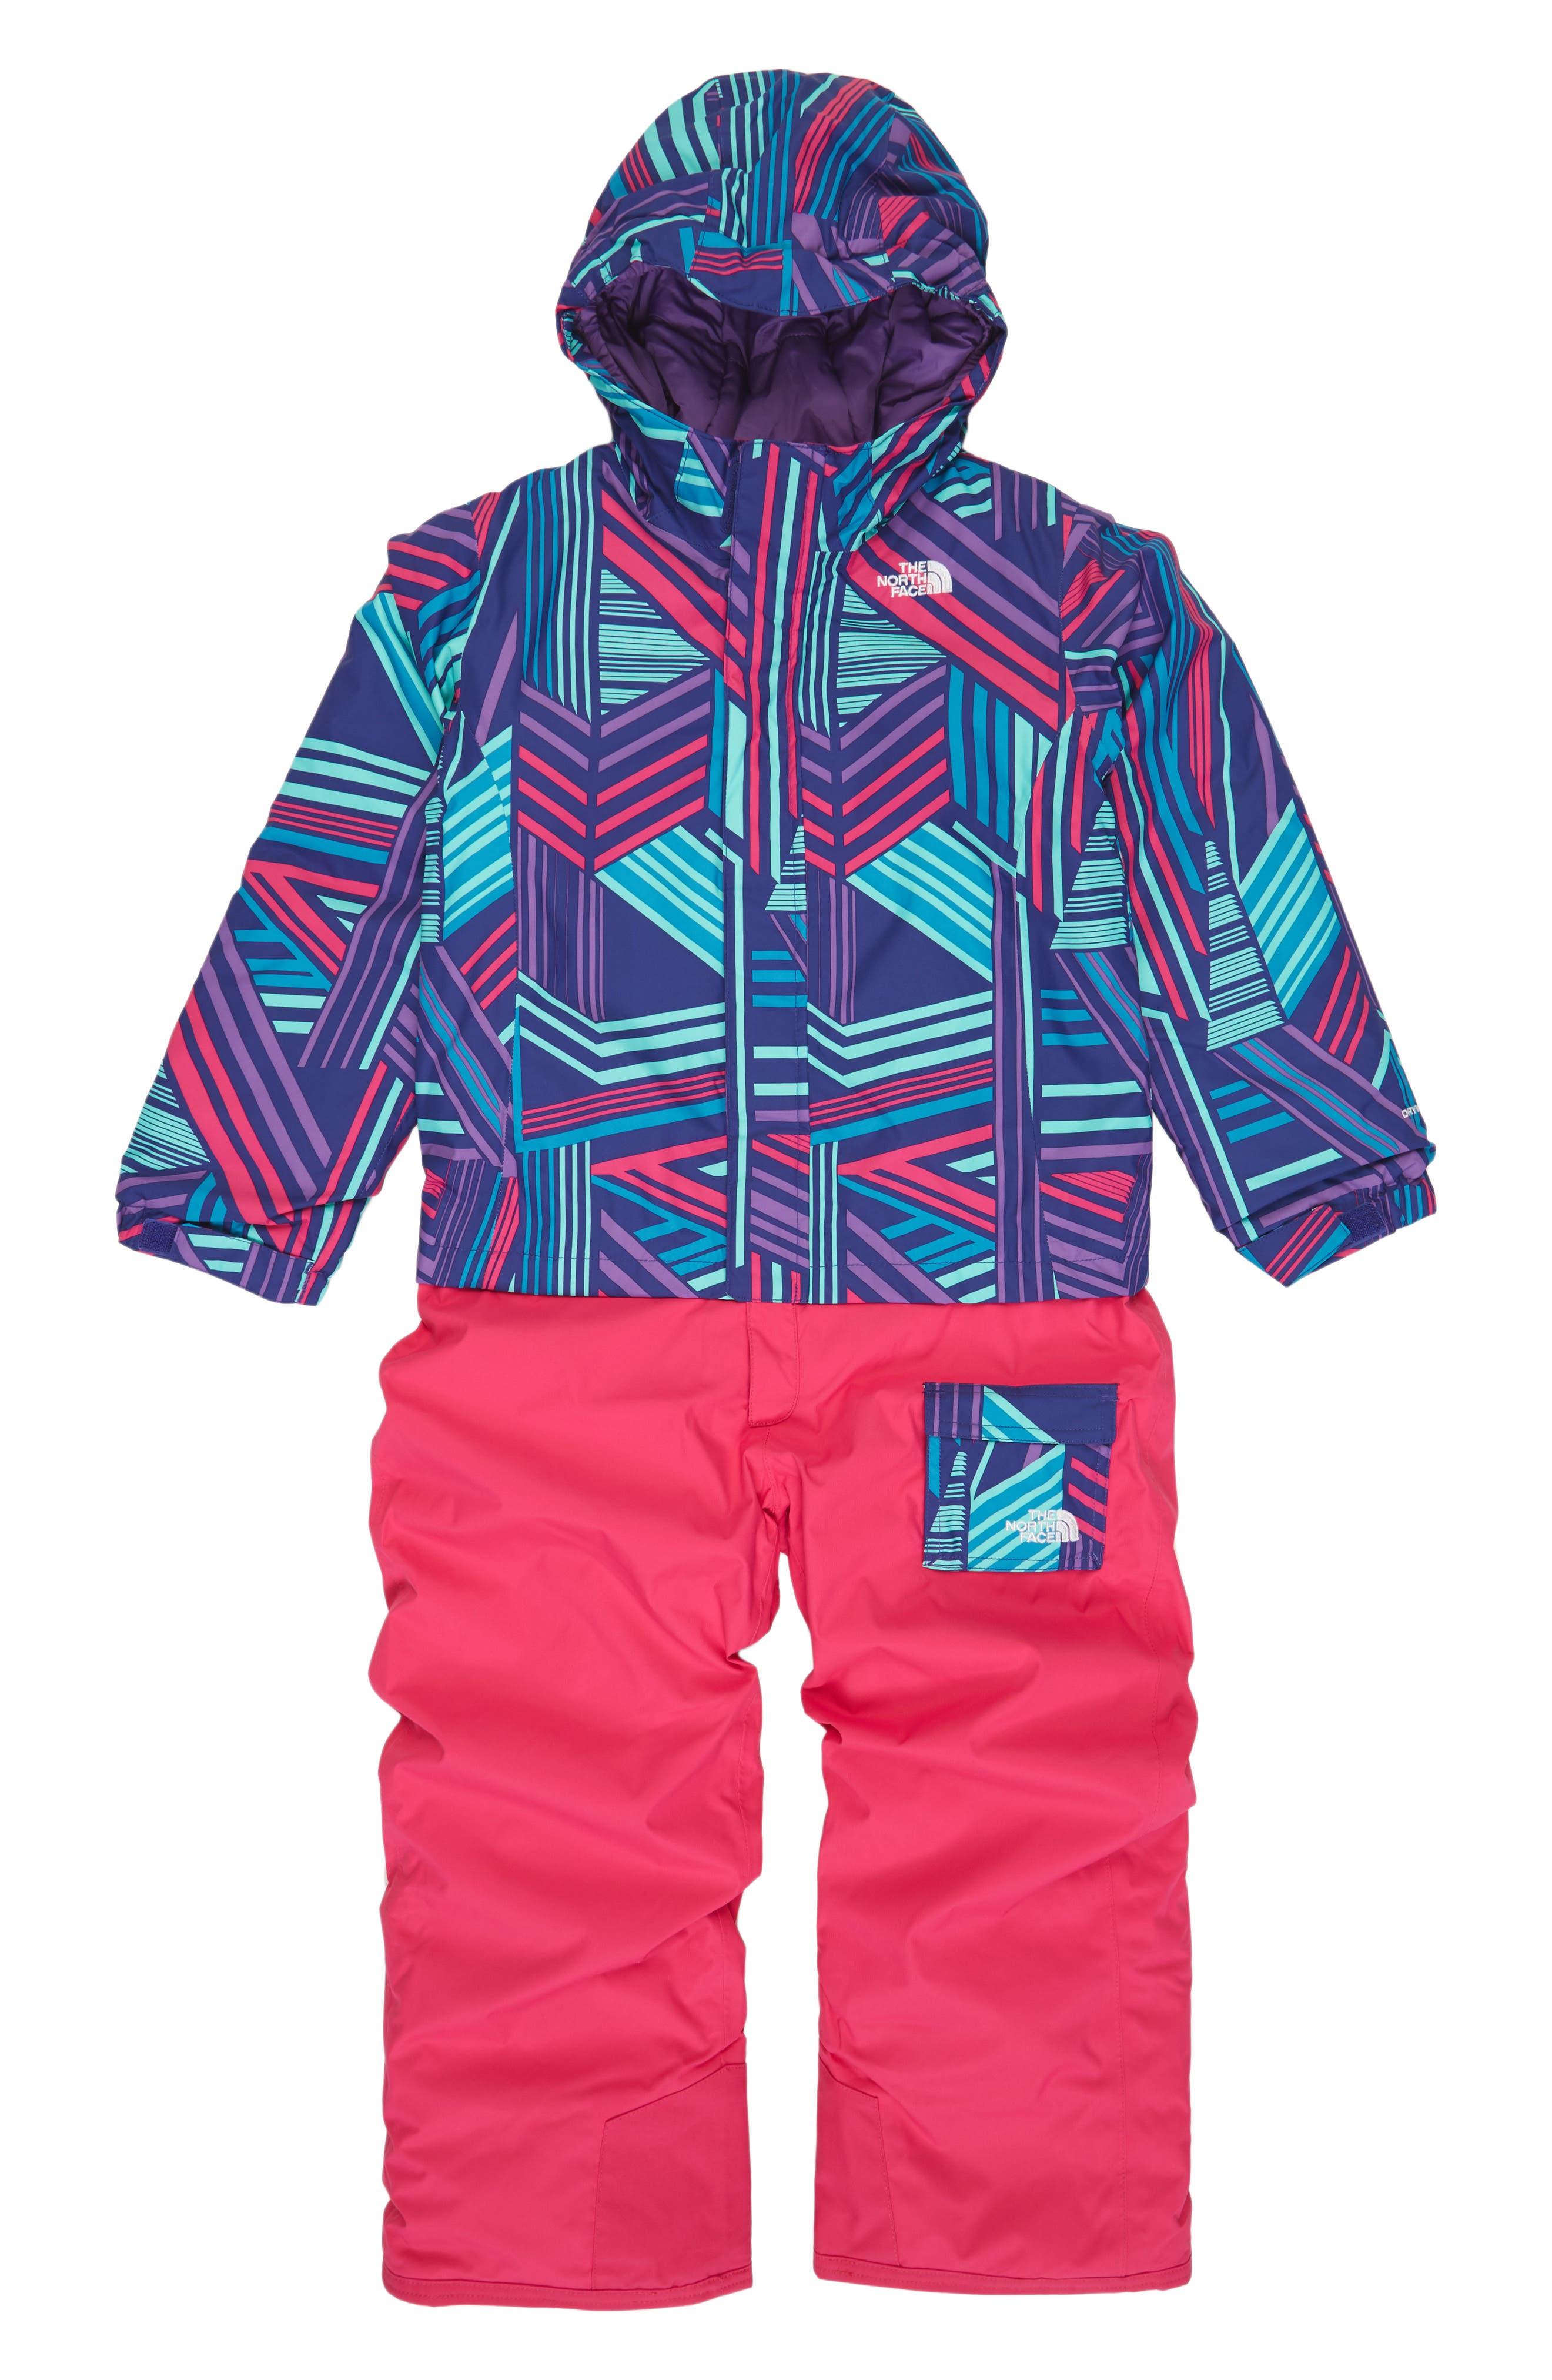 Heatseeker<sup>™</sup> Insulated Waterproof Snowsuit,                         Main,                         color, Petticoat Pink